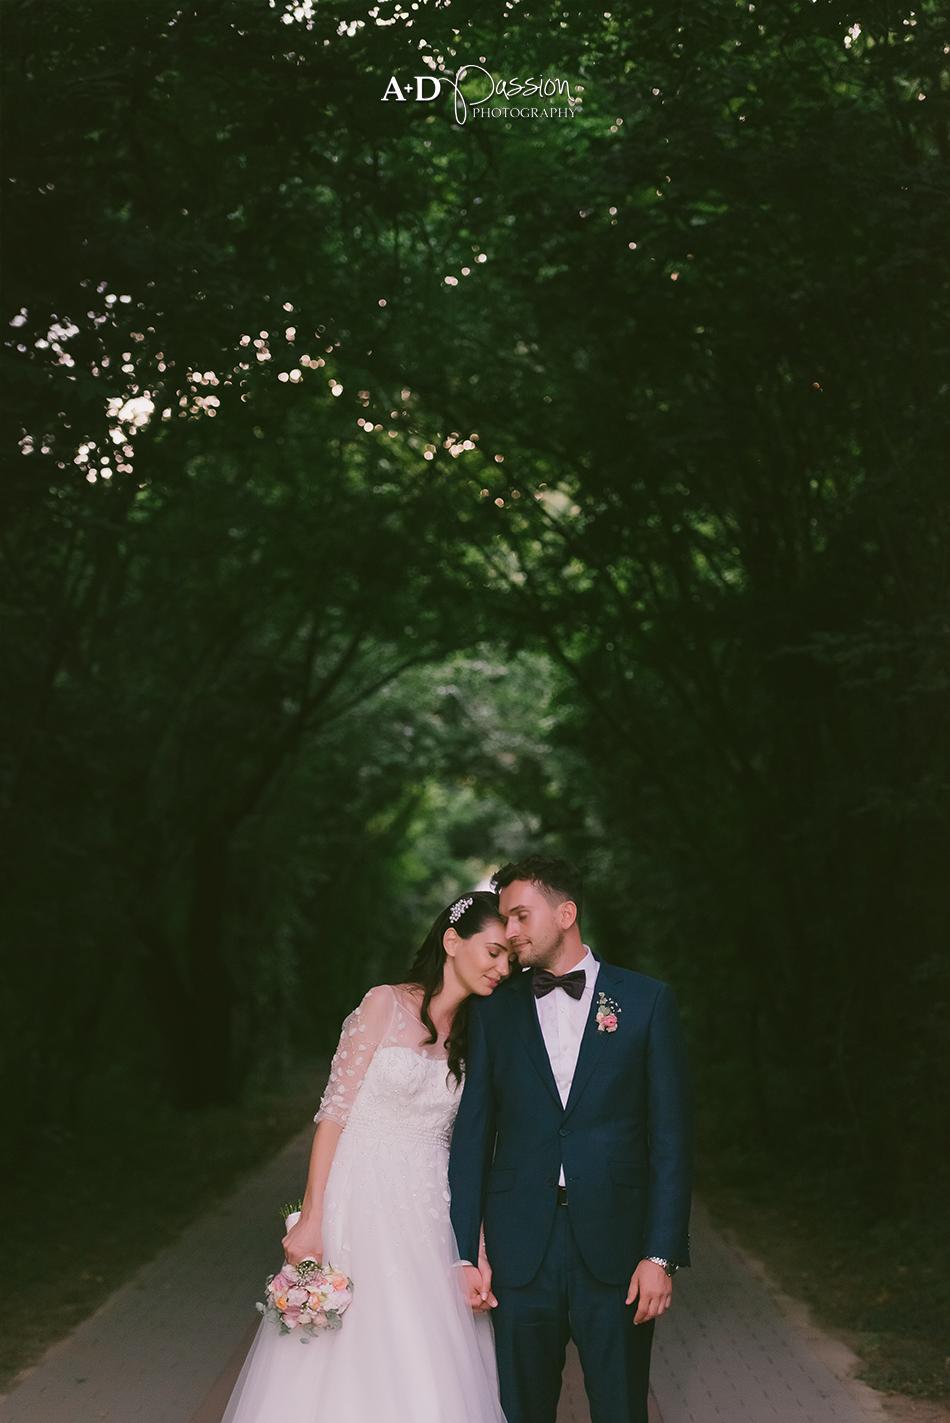 AD Passion Photography | evelina_fineas_adelin_fotograf_nunta_0065 | Adelin, Dida, fotograf profesionist, fotograf de nunta, fotografie de nunta, fotograf Timisoara, fotograf Craiova, fotograf Bucuresti, fotograf Arad, nunta Timisoara, nunta Arad, nunta Bucuresti, nunta Craiova